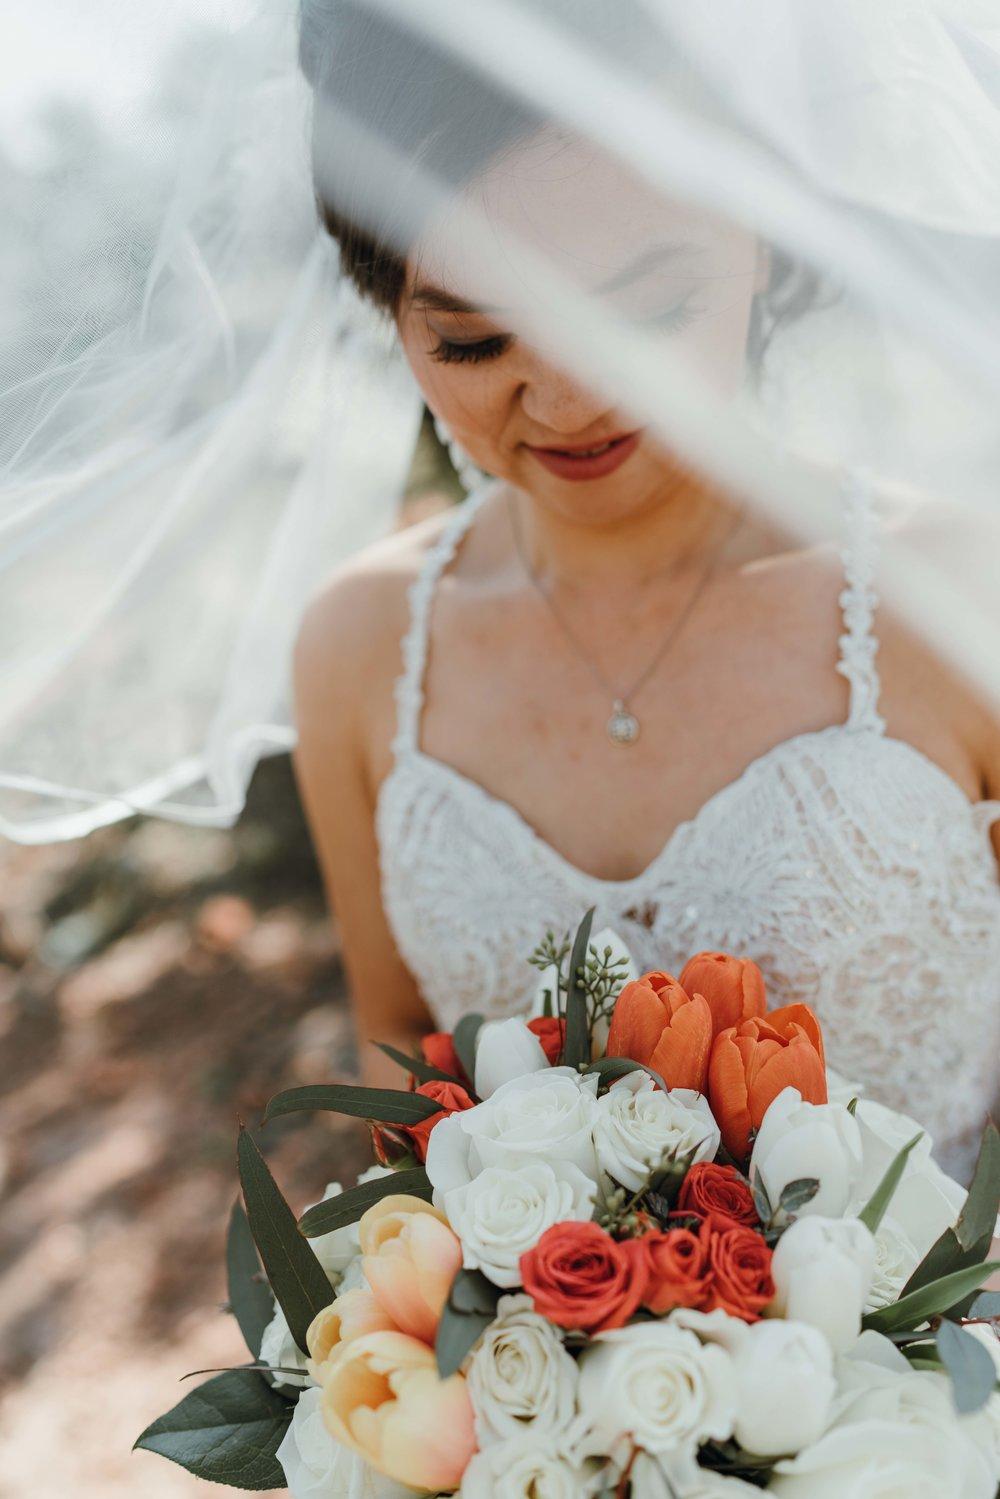 denver wedding photographer lioncrest manor in lyons ben and mali -DSC06177.jpg